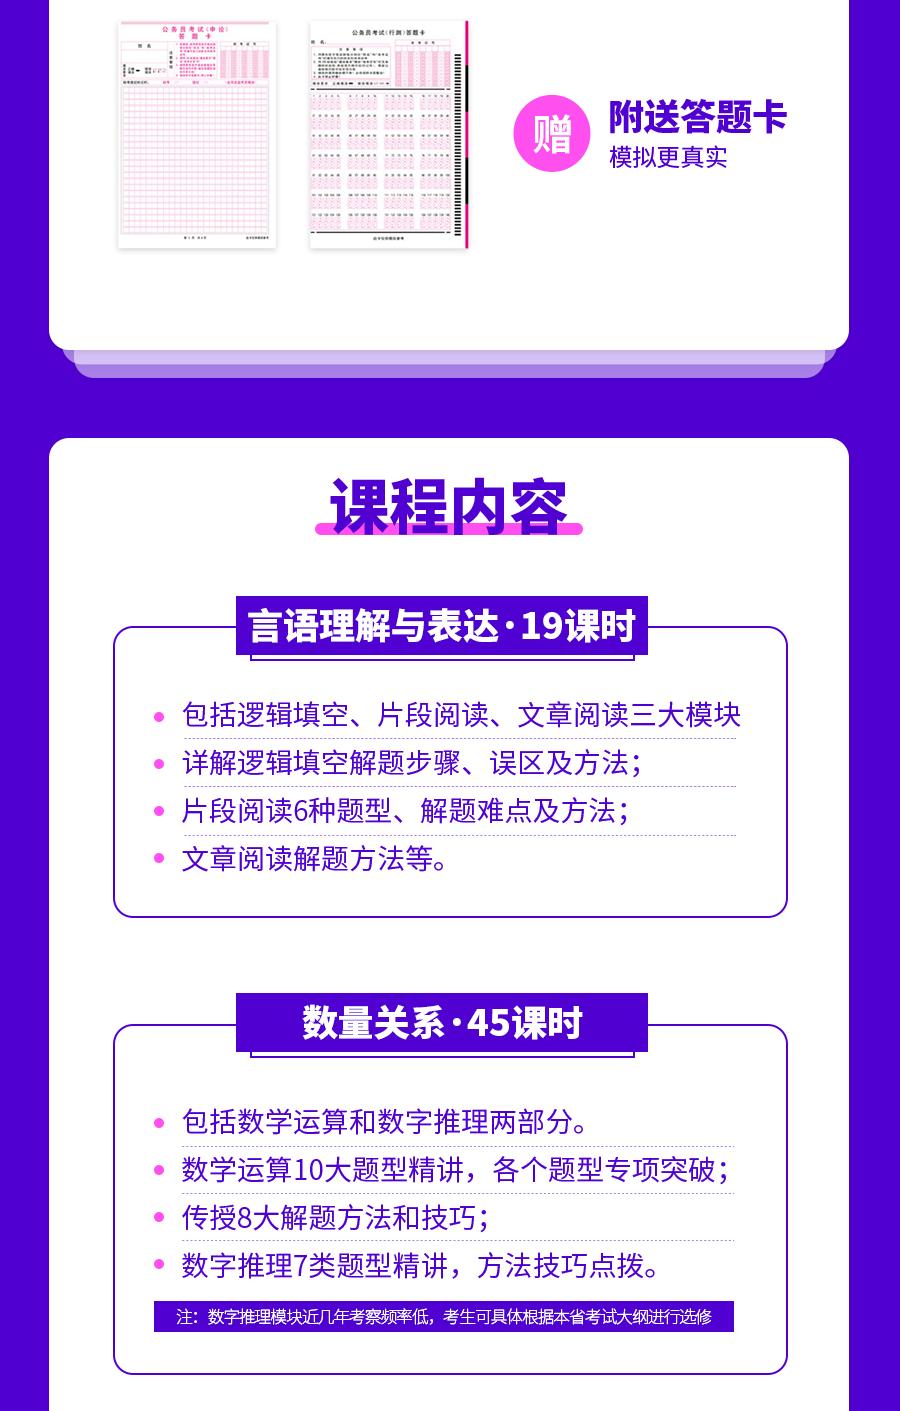 上海_05